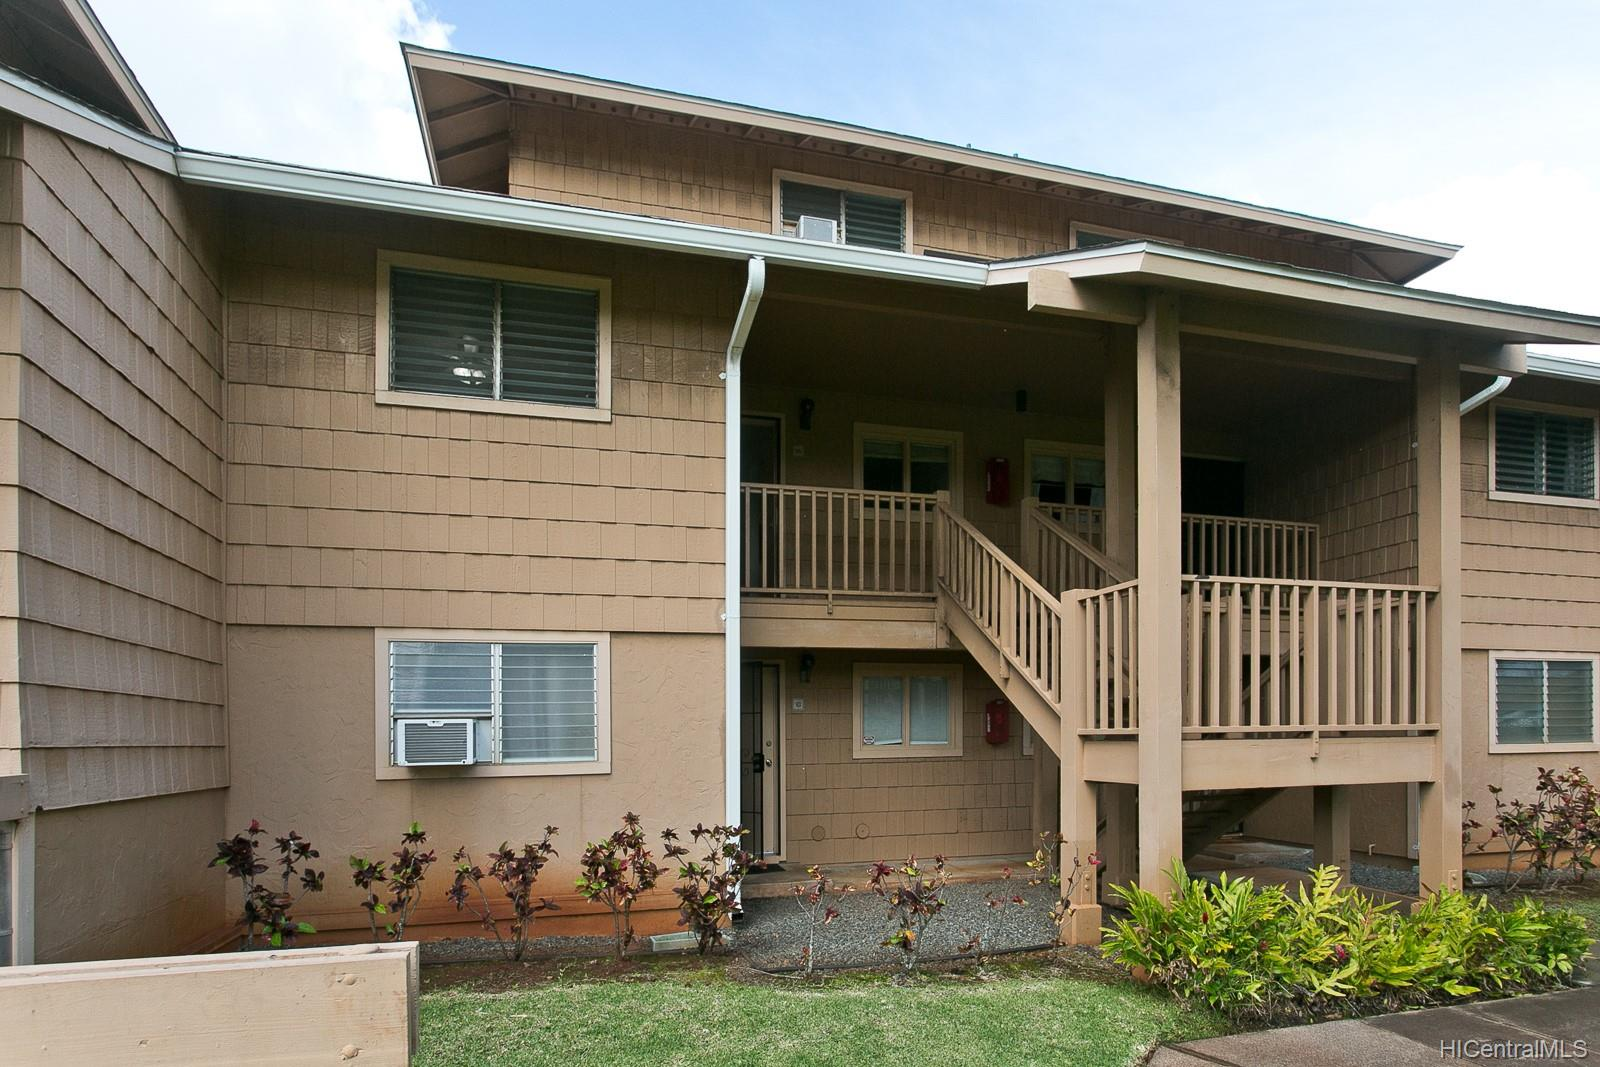 98-1369 Koaheahe Place townhouse # 9/88, Pearl City, Hawaii - photo 17 of 17